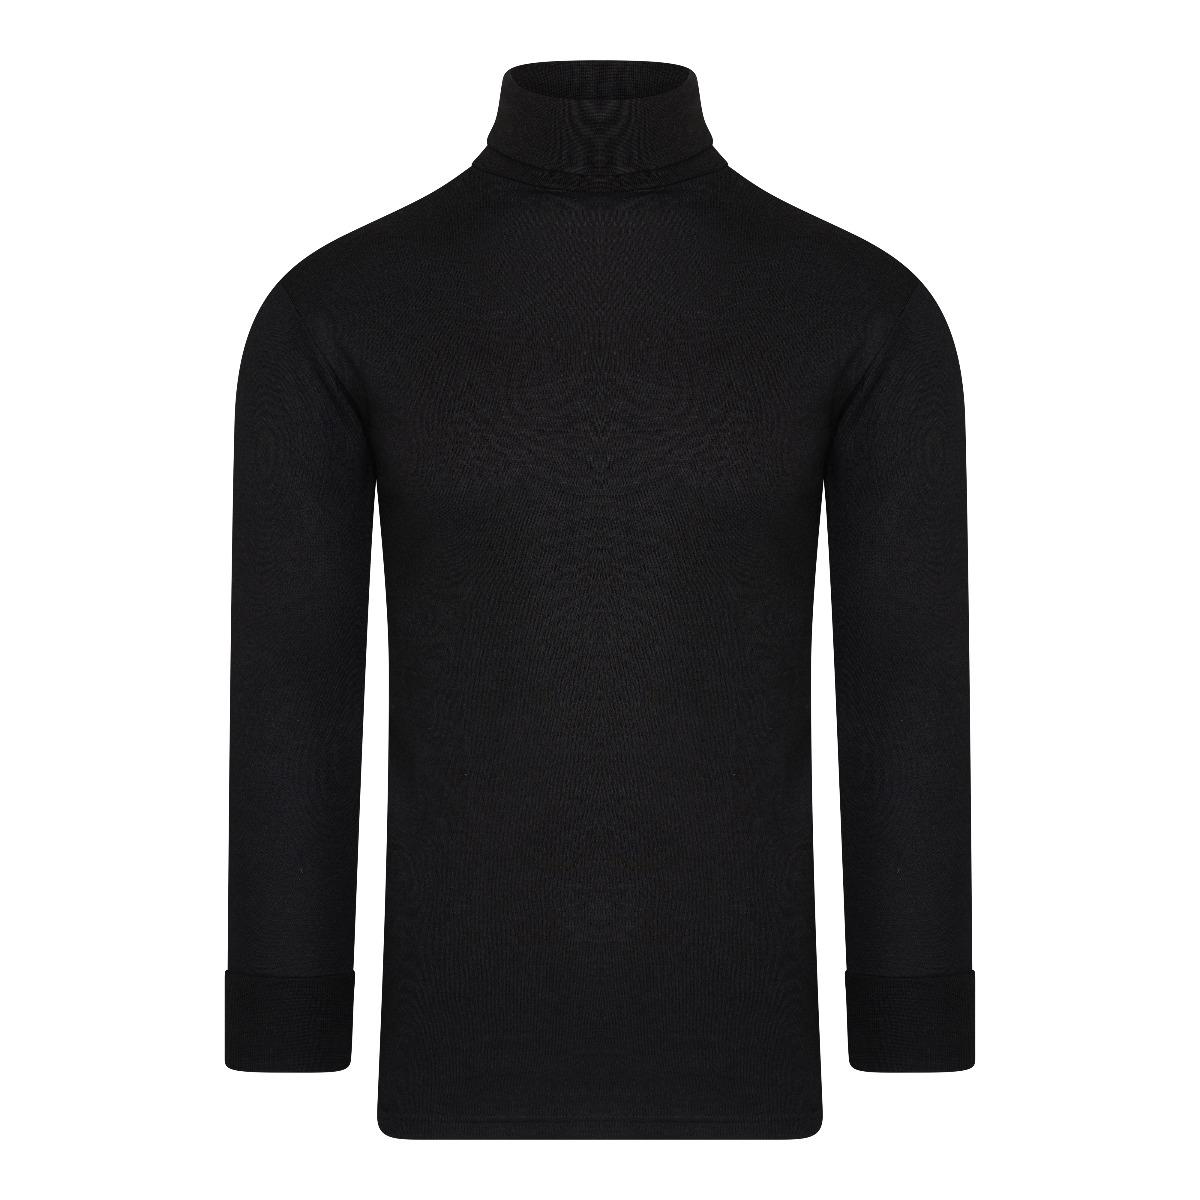 Beeren Thermo Unisex Shirt Col Lange Mouw Zwart XL